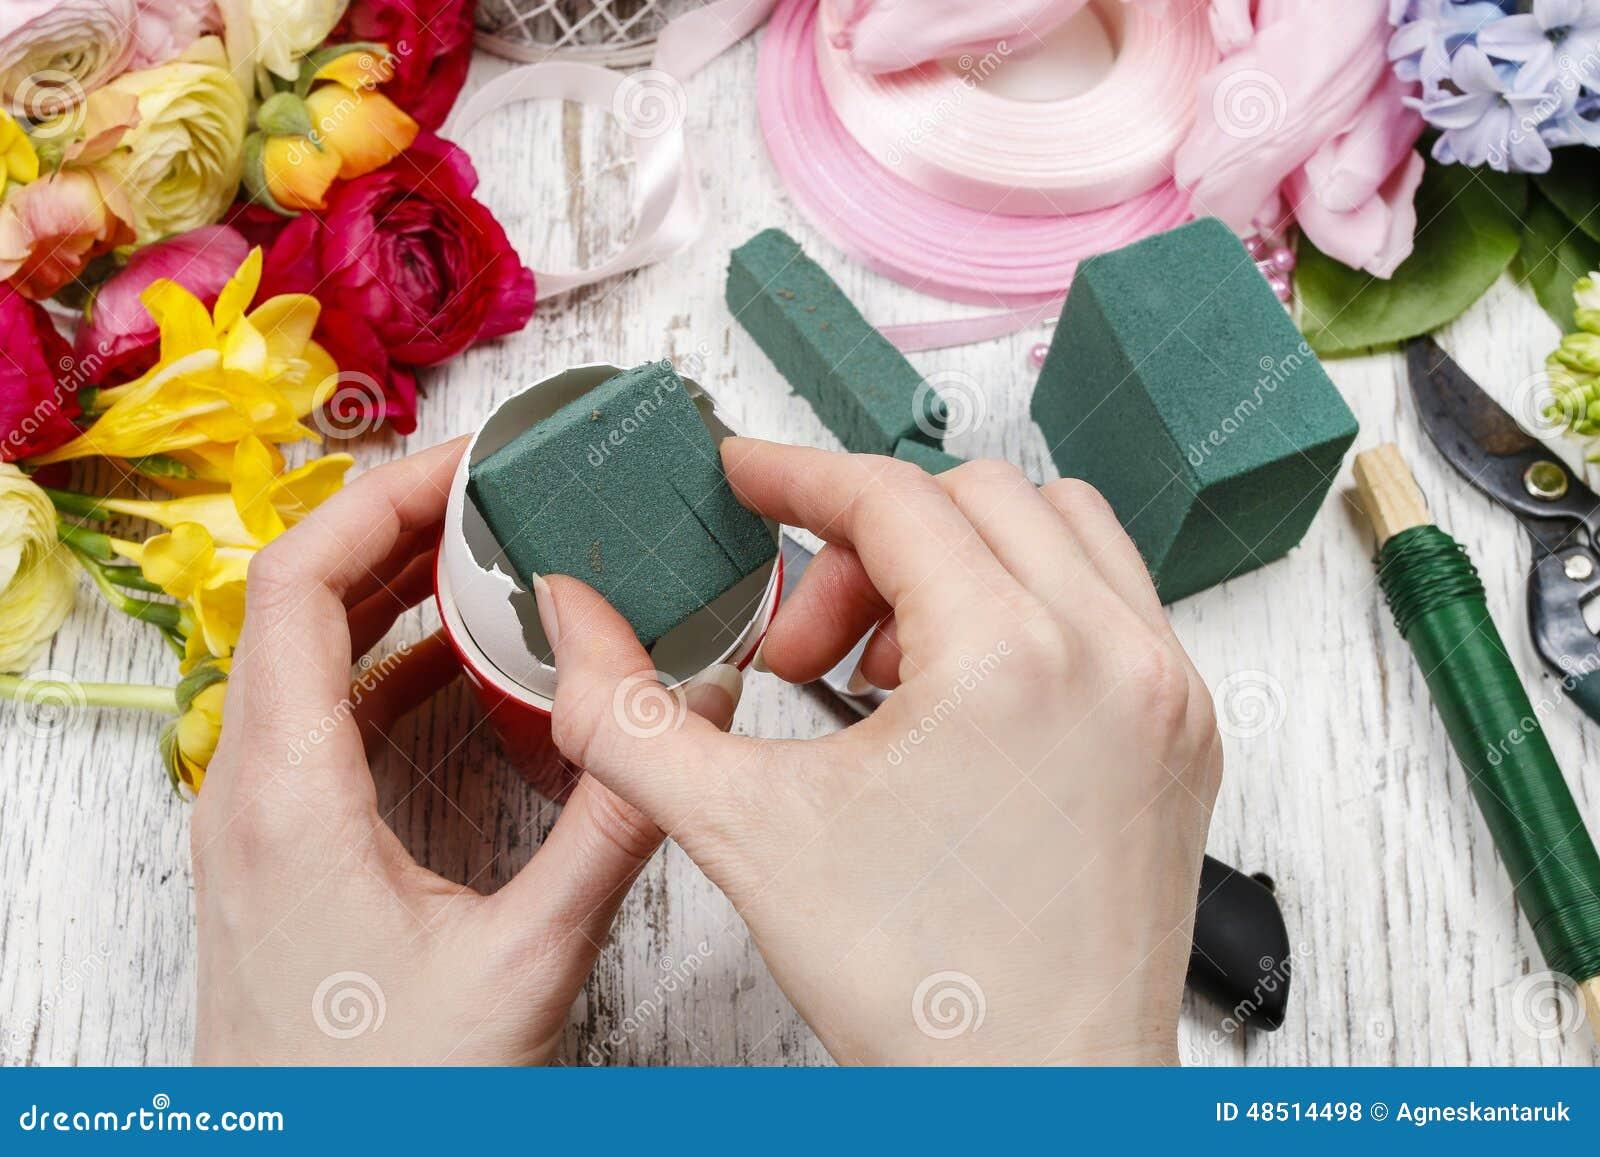 Comment Faire Un Bouquet De Roses how to make spring bouquet of flowers in goose egg shell